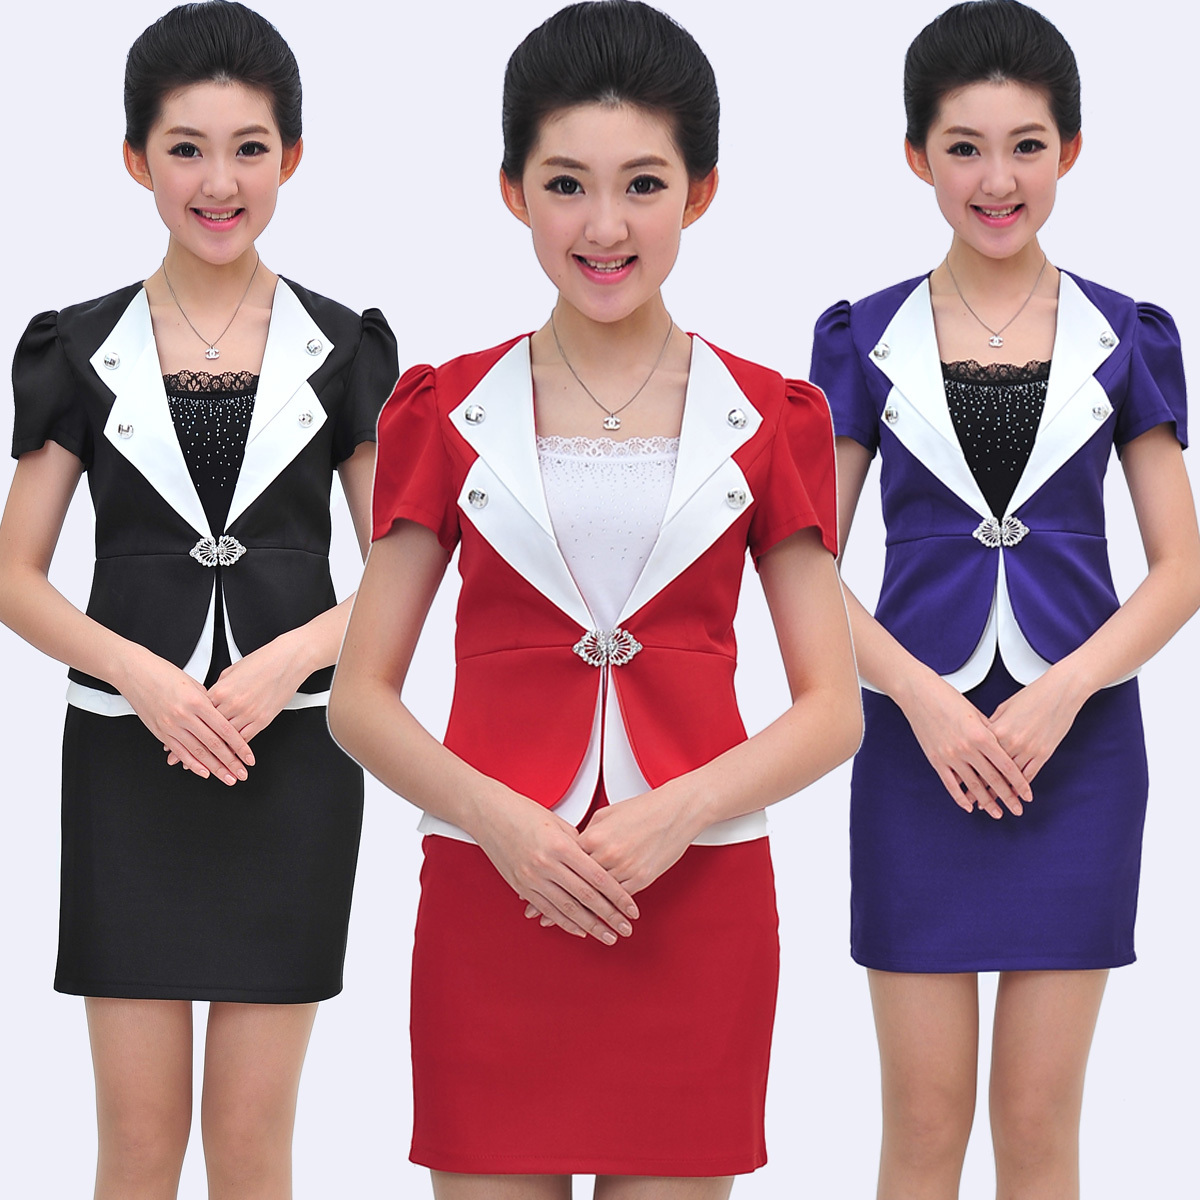 Hotel Front Desk Uniforms For Women